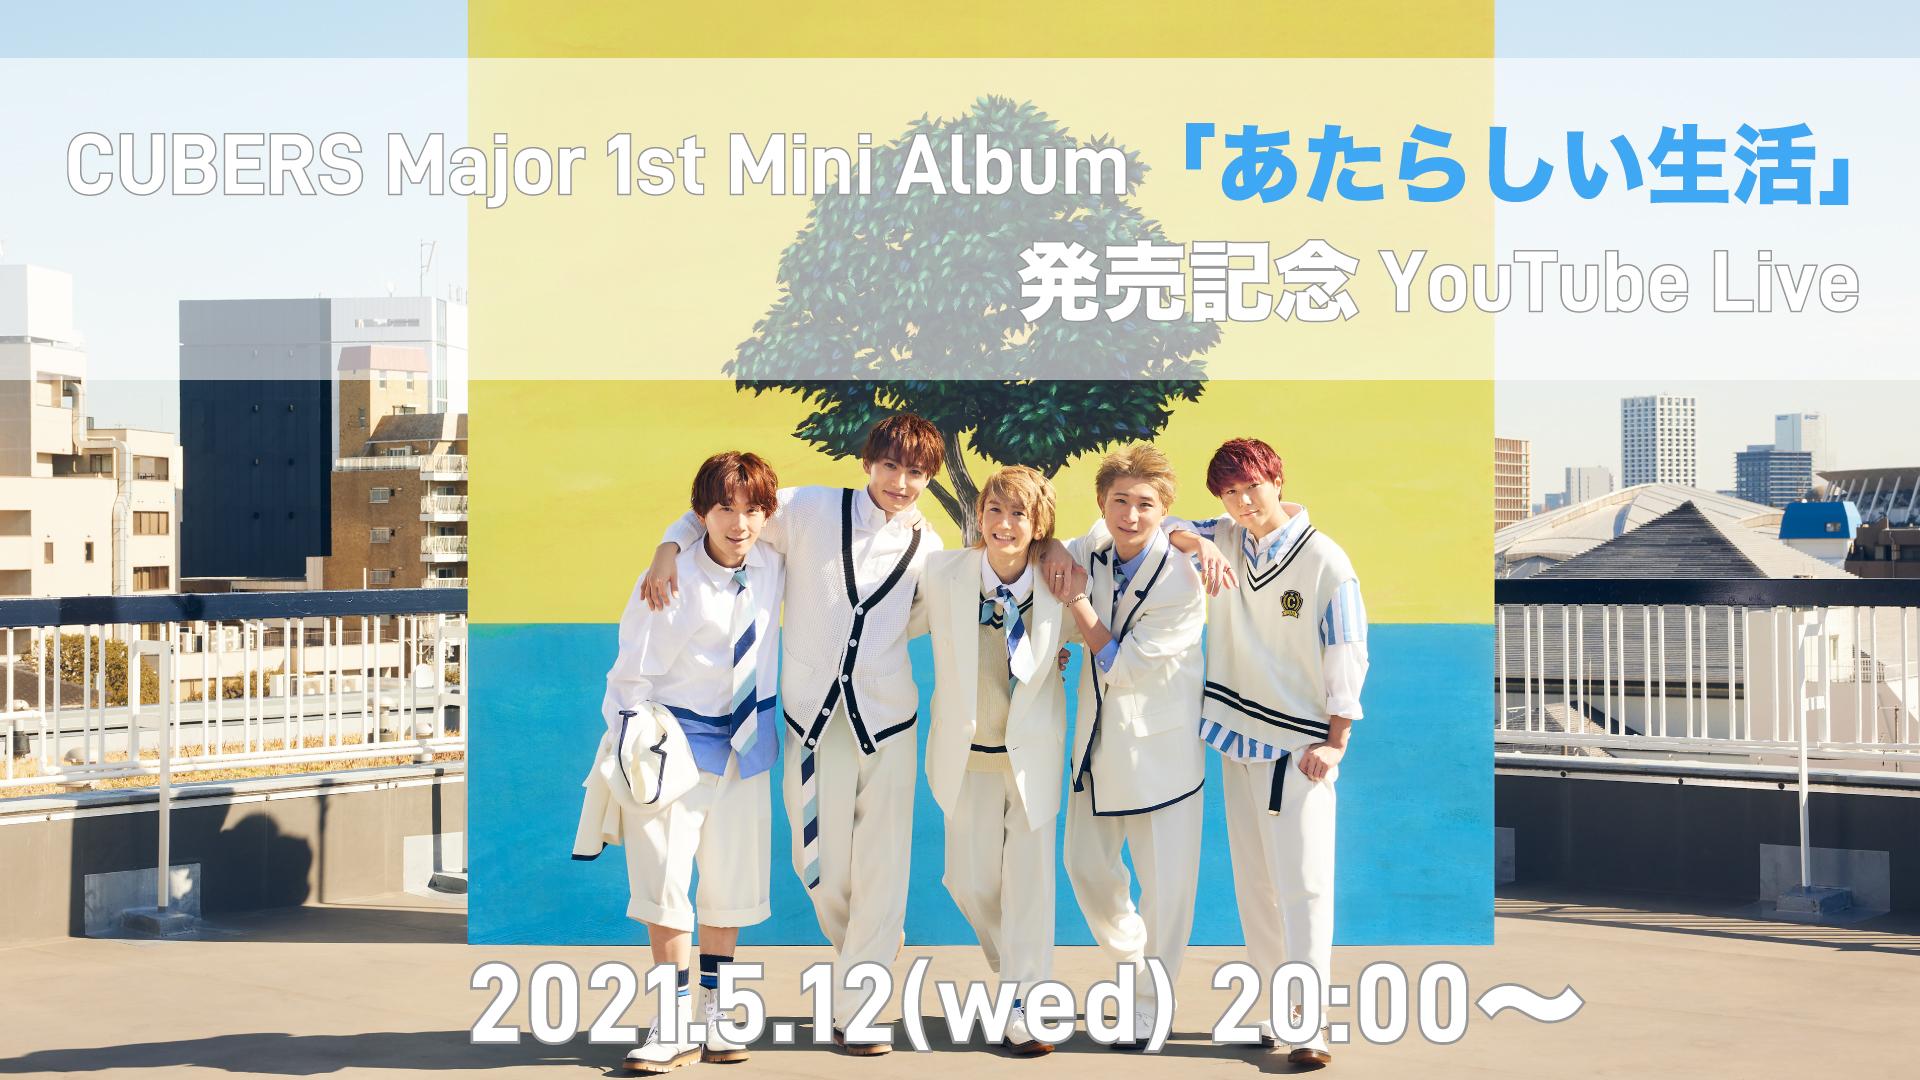 【NEWS】5/12(水) ミニアルバム「あたらしい生活」発売記念YouTube Liveを無料生配信 決定!